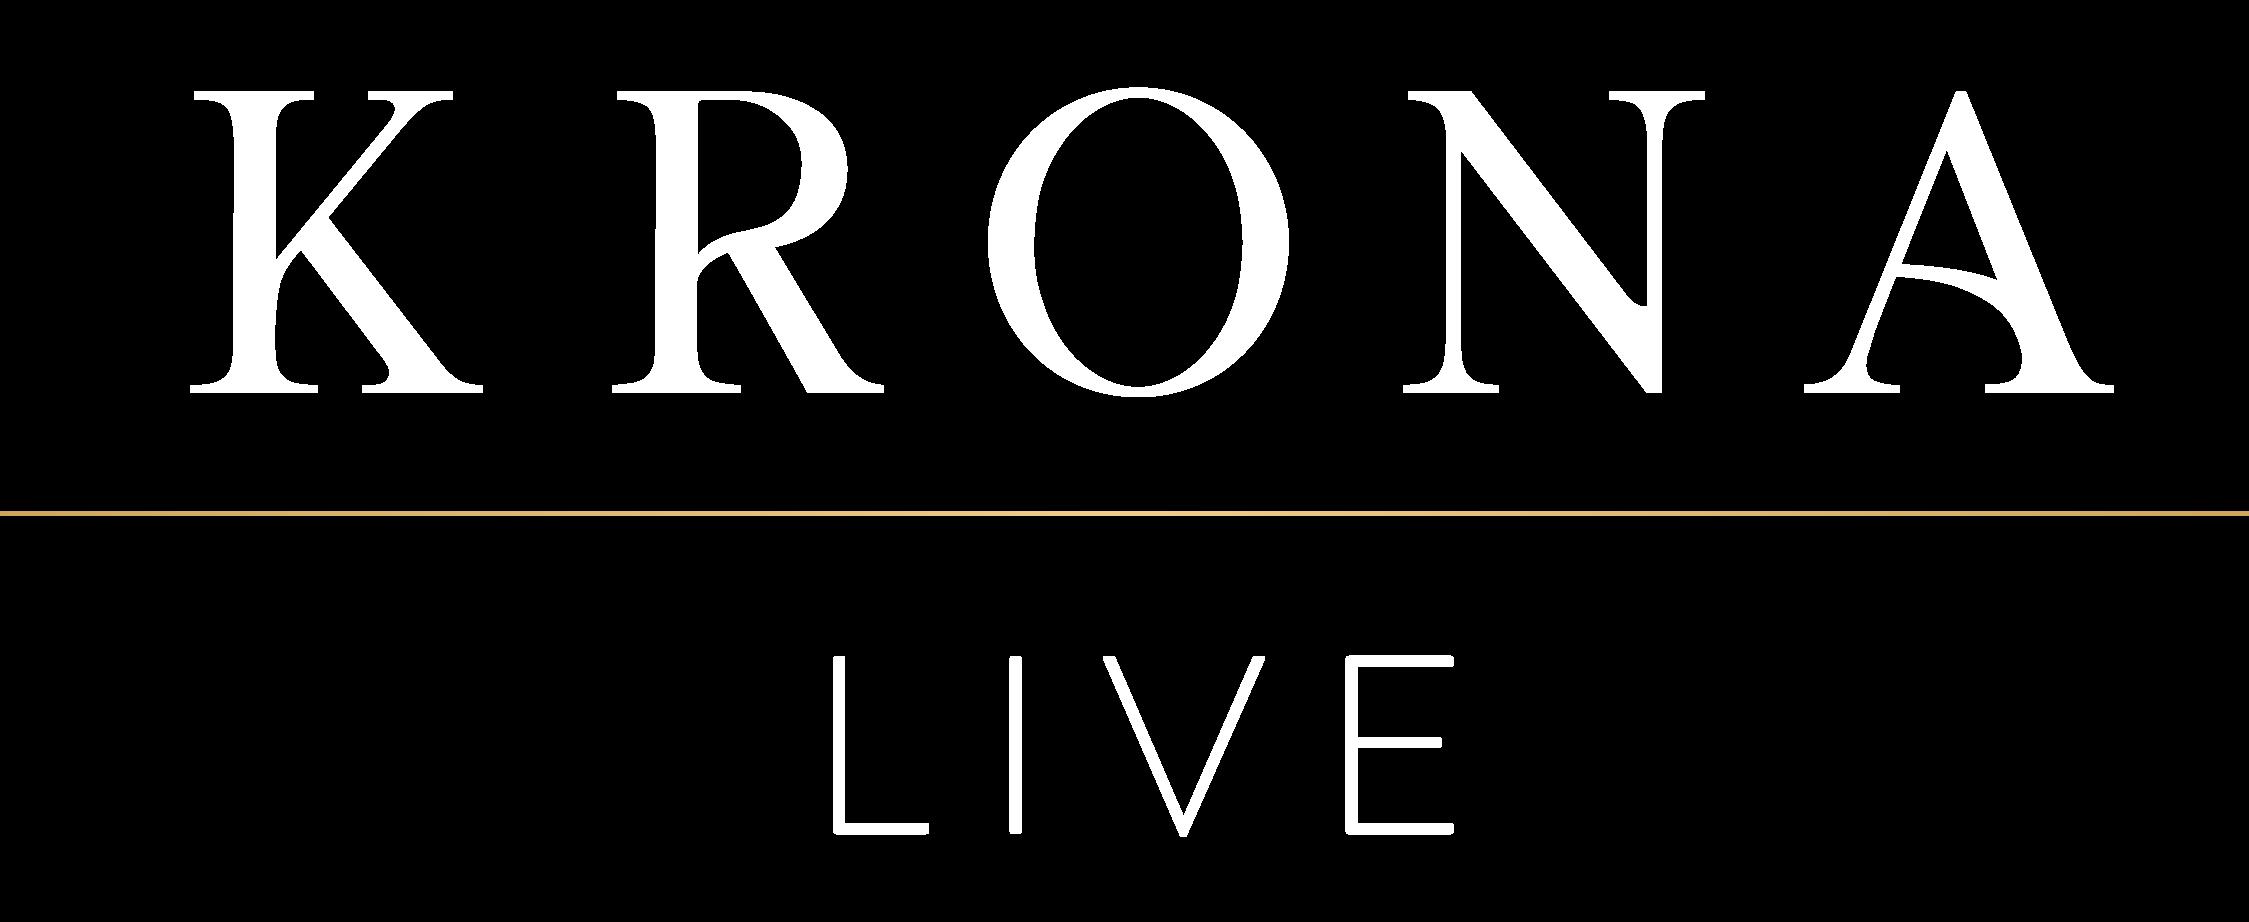 Kron_Live_W.png